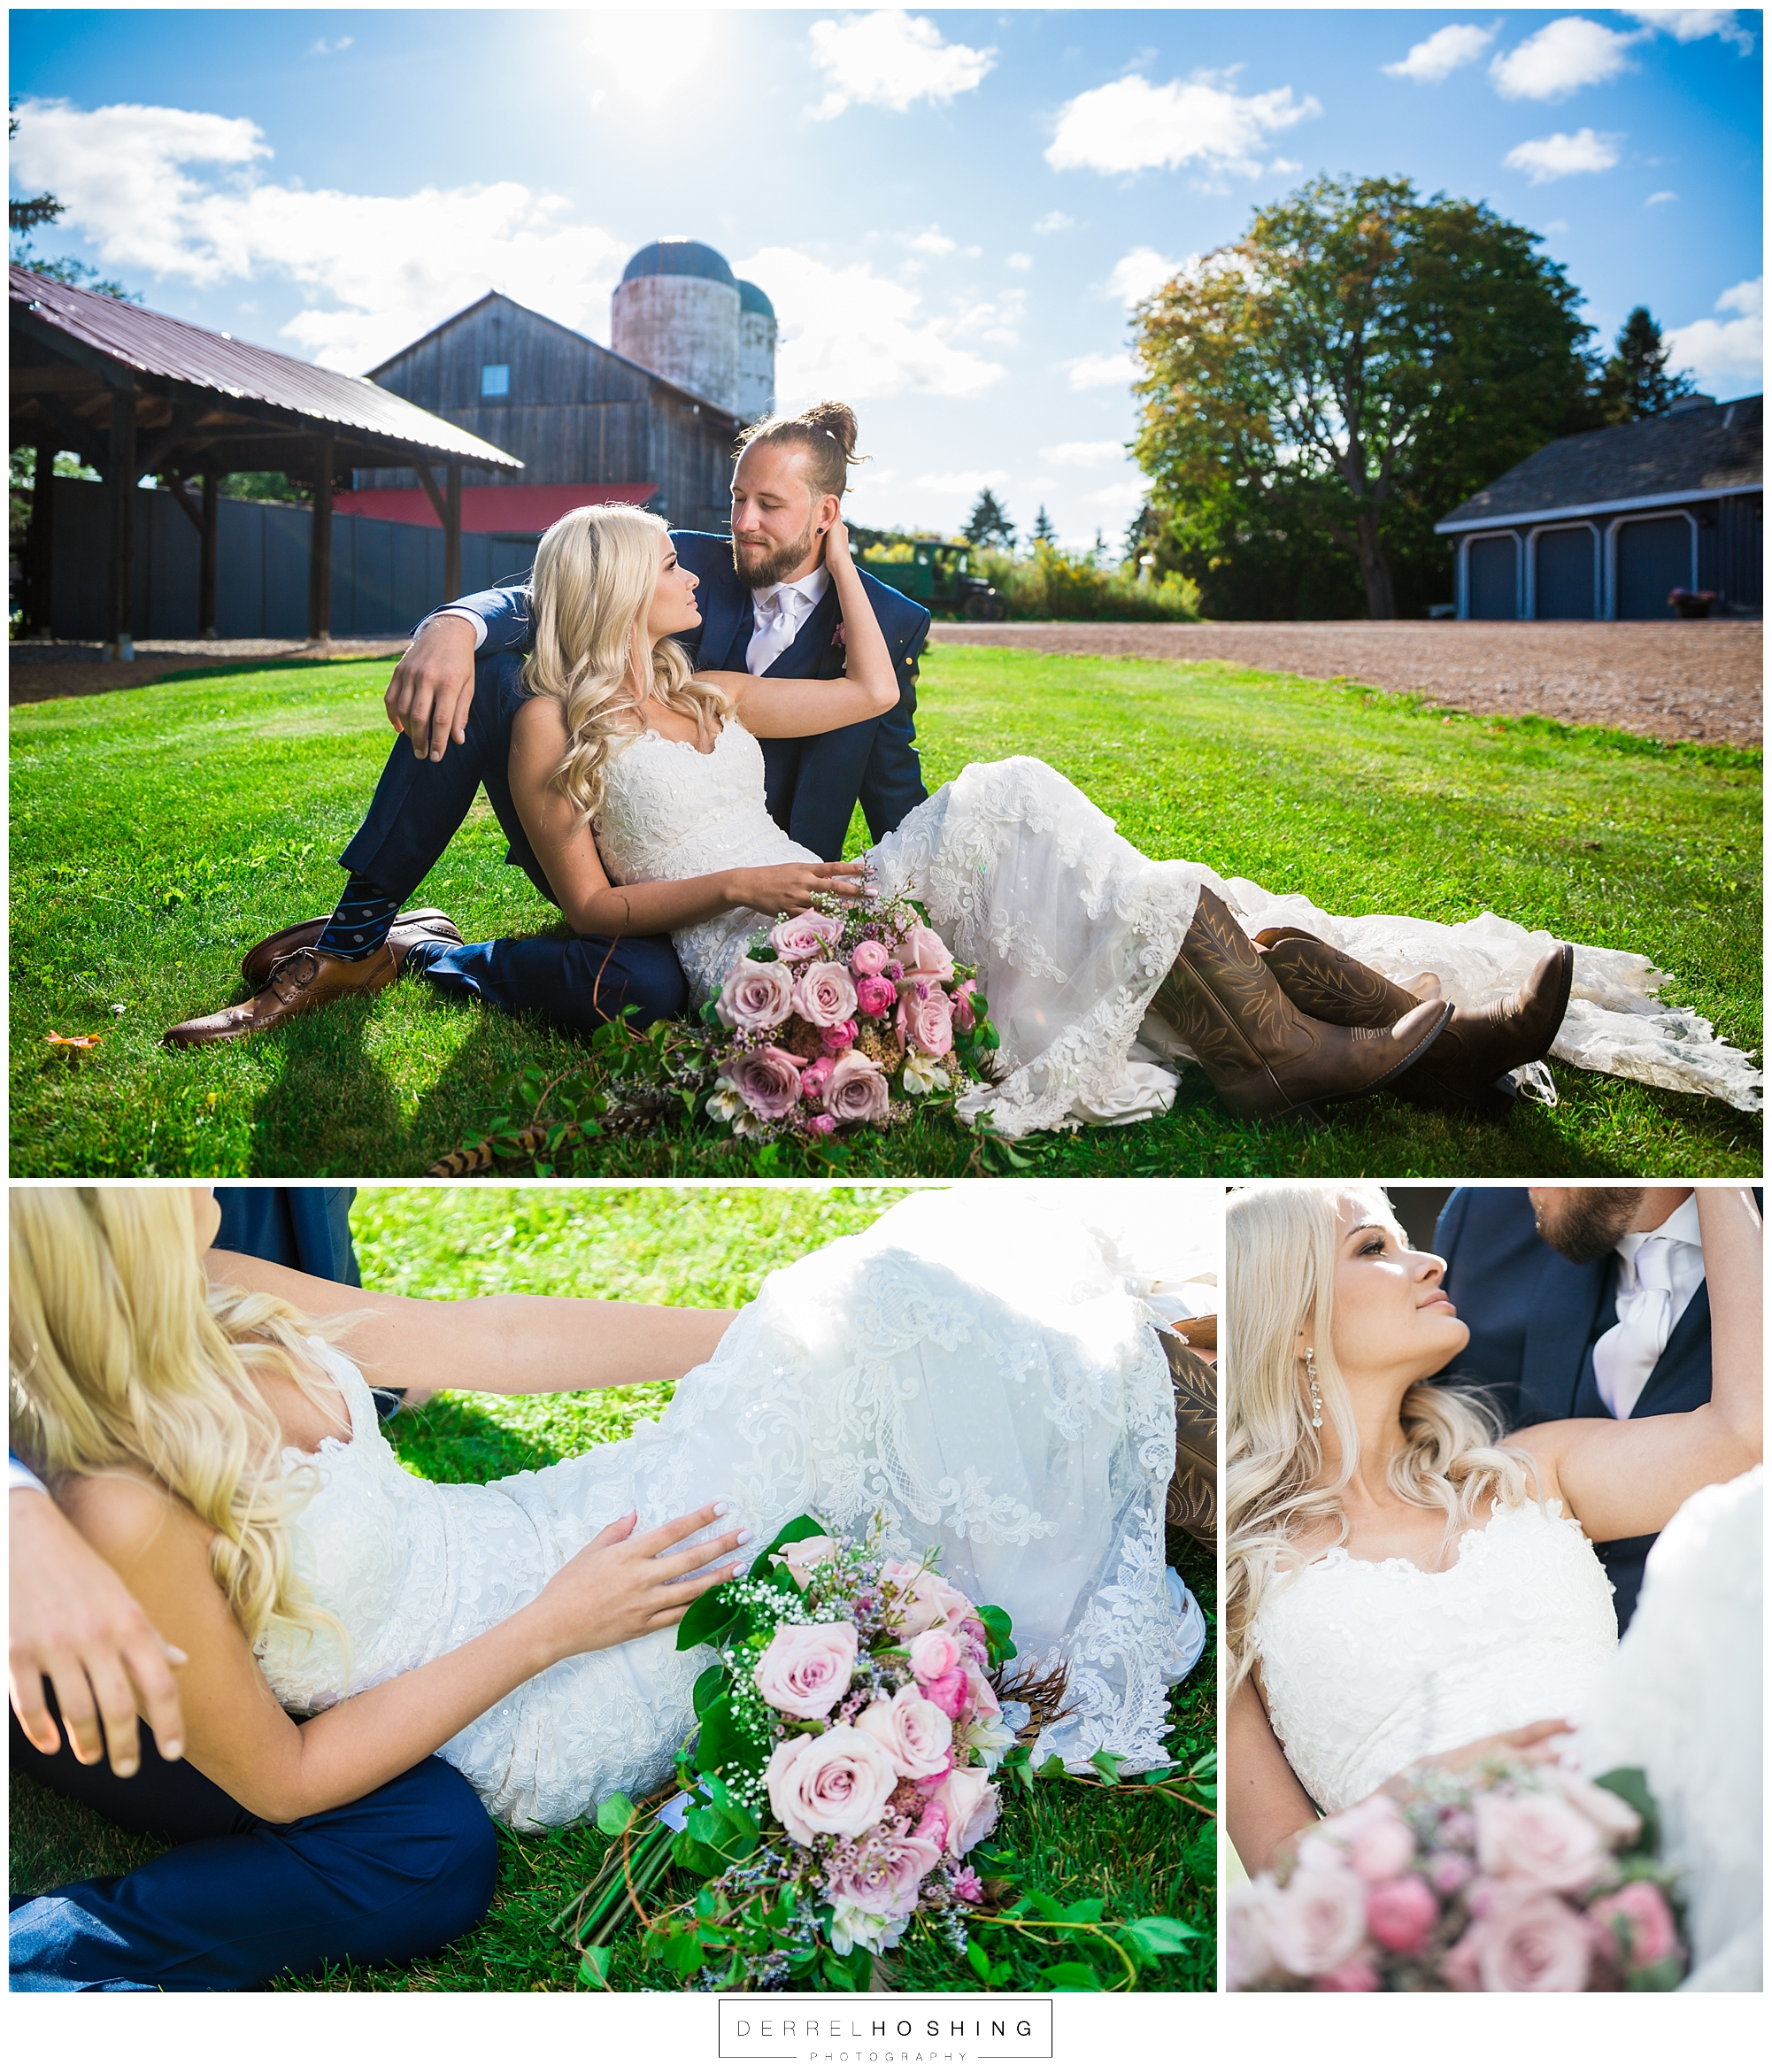 Belcroft-Estates-&-Event-Centre-Wedding-Innisfil-Ontario-0021.jpg